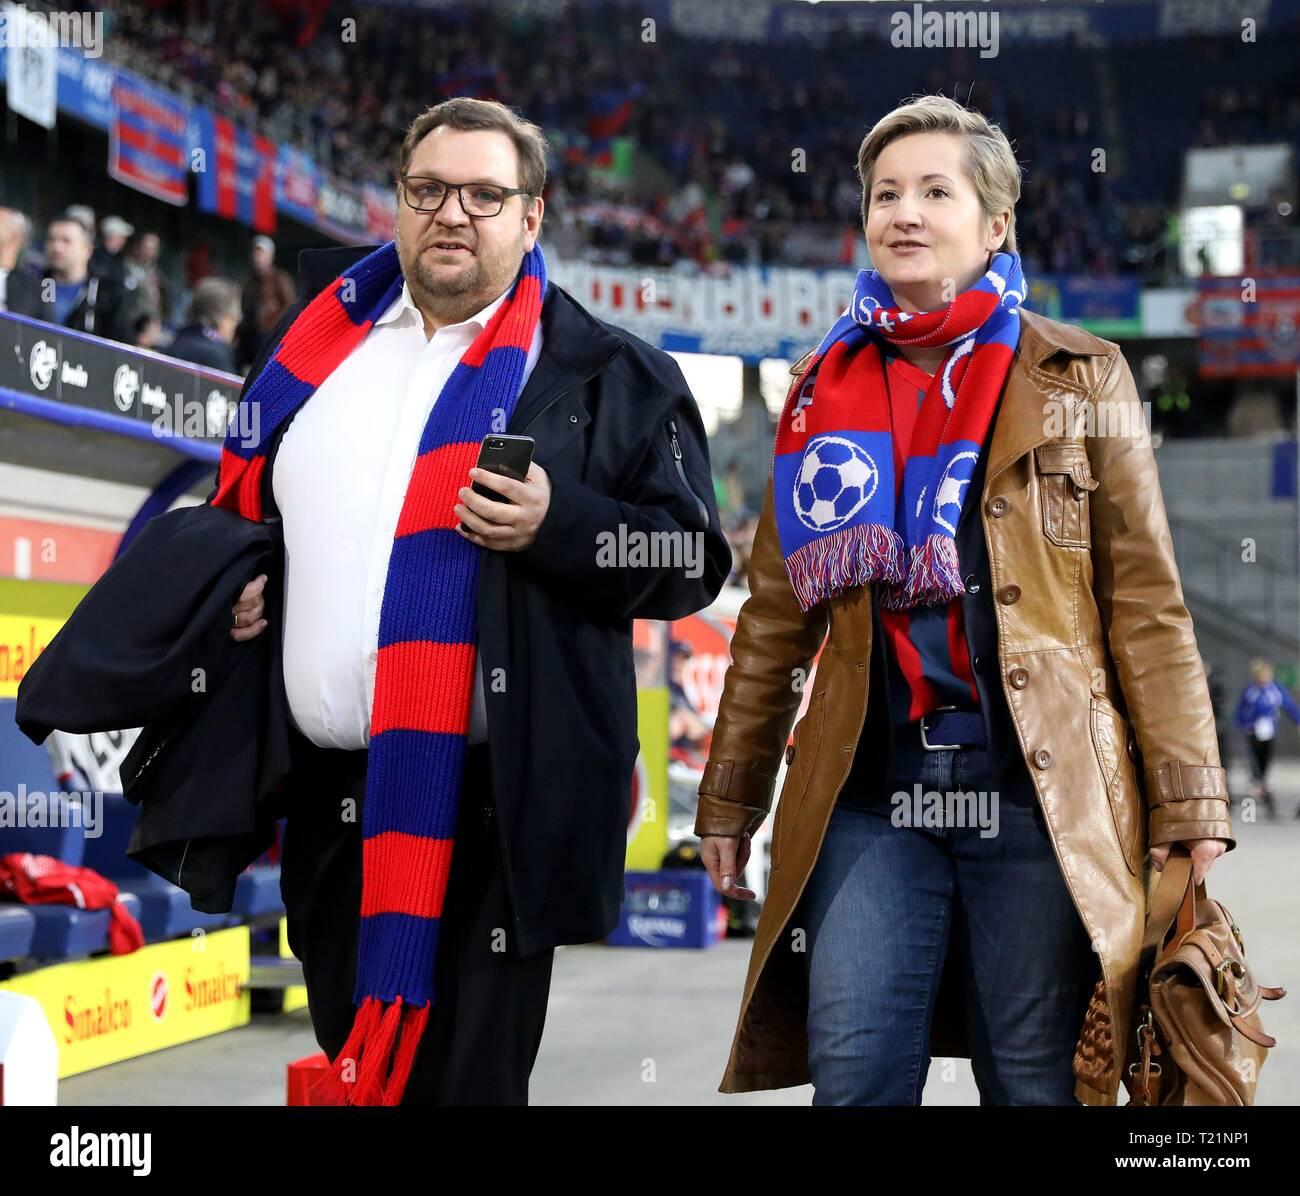 firo: 29.03.2019 Football, 3rd Bundesliga, season 2018/2019 KFC Uerdingen 05 - 1. FC Kaiserslautern Frank Meyer (Chief Mayor of Krefeld) with his wife Kathrin in the stadium. | usage worldwide Stock Photo